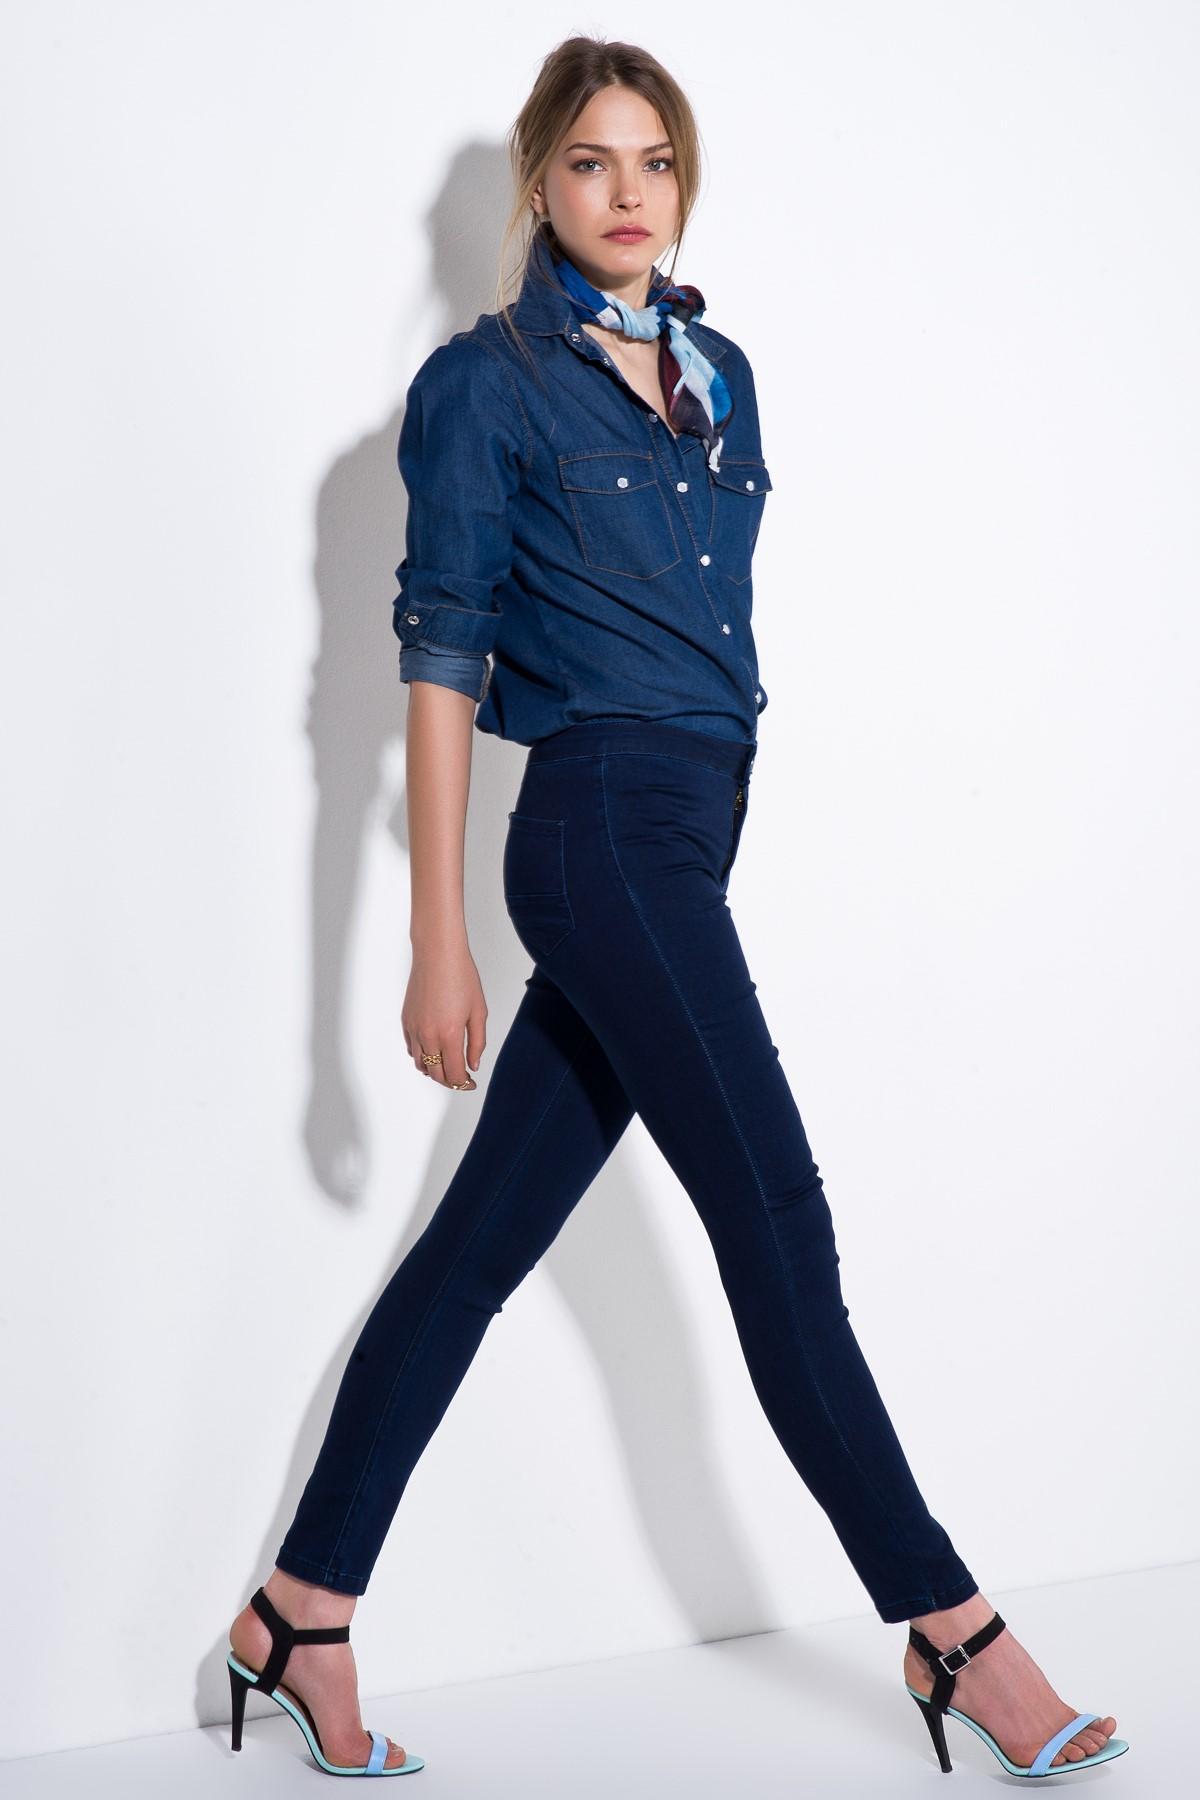 Lacivert 2015 Yüksek Bel Pantolon Modelleri